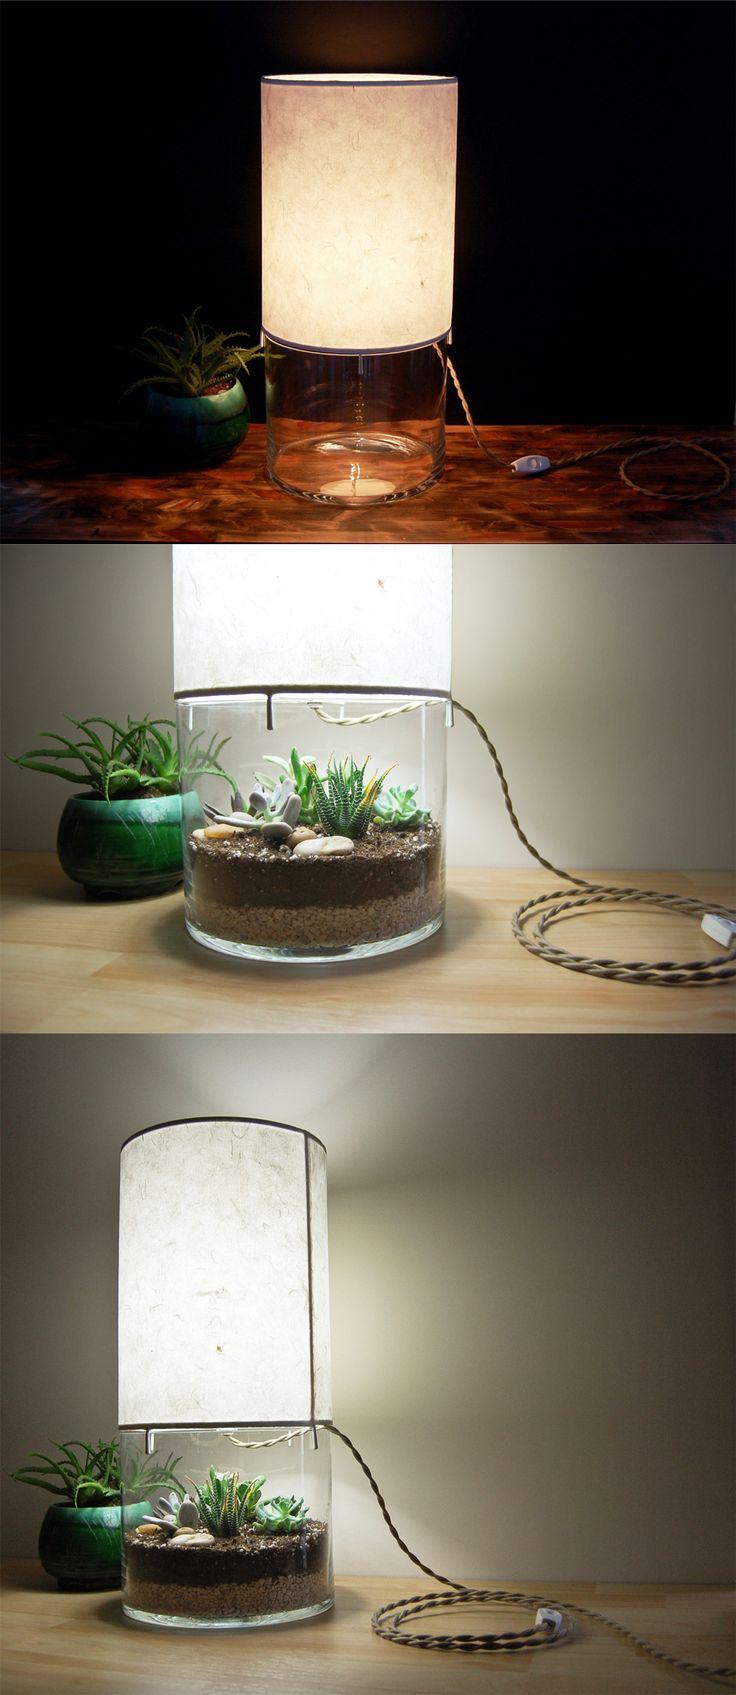 Mini jardin sous la lampe